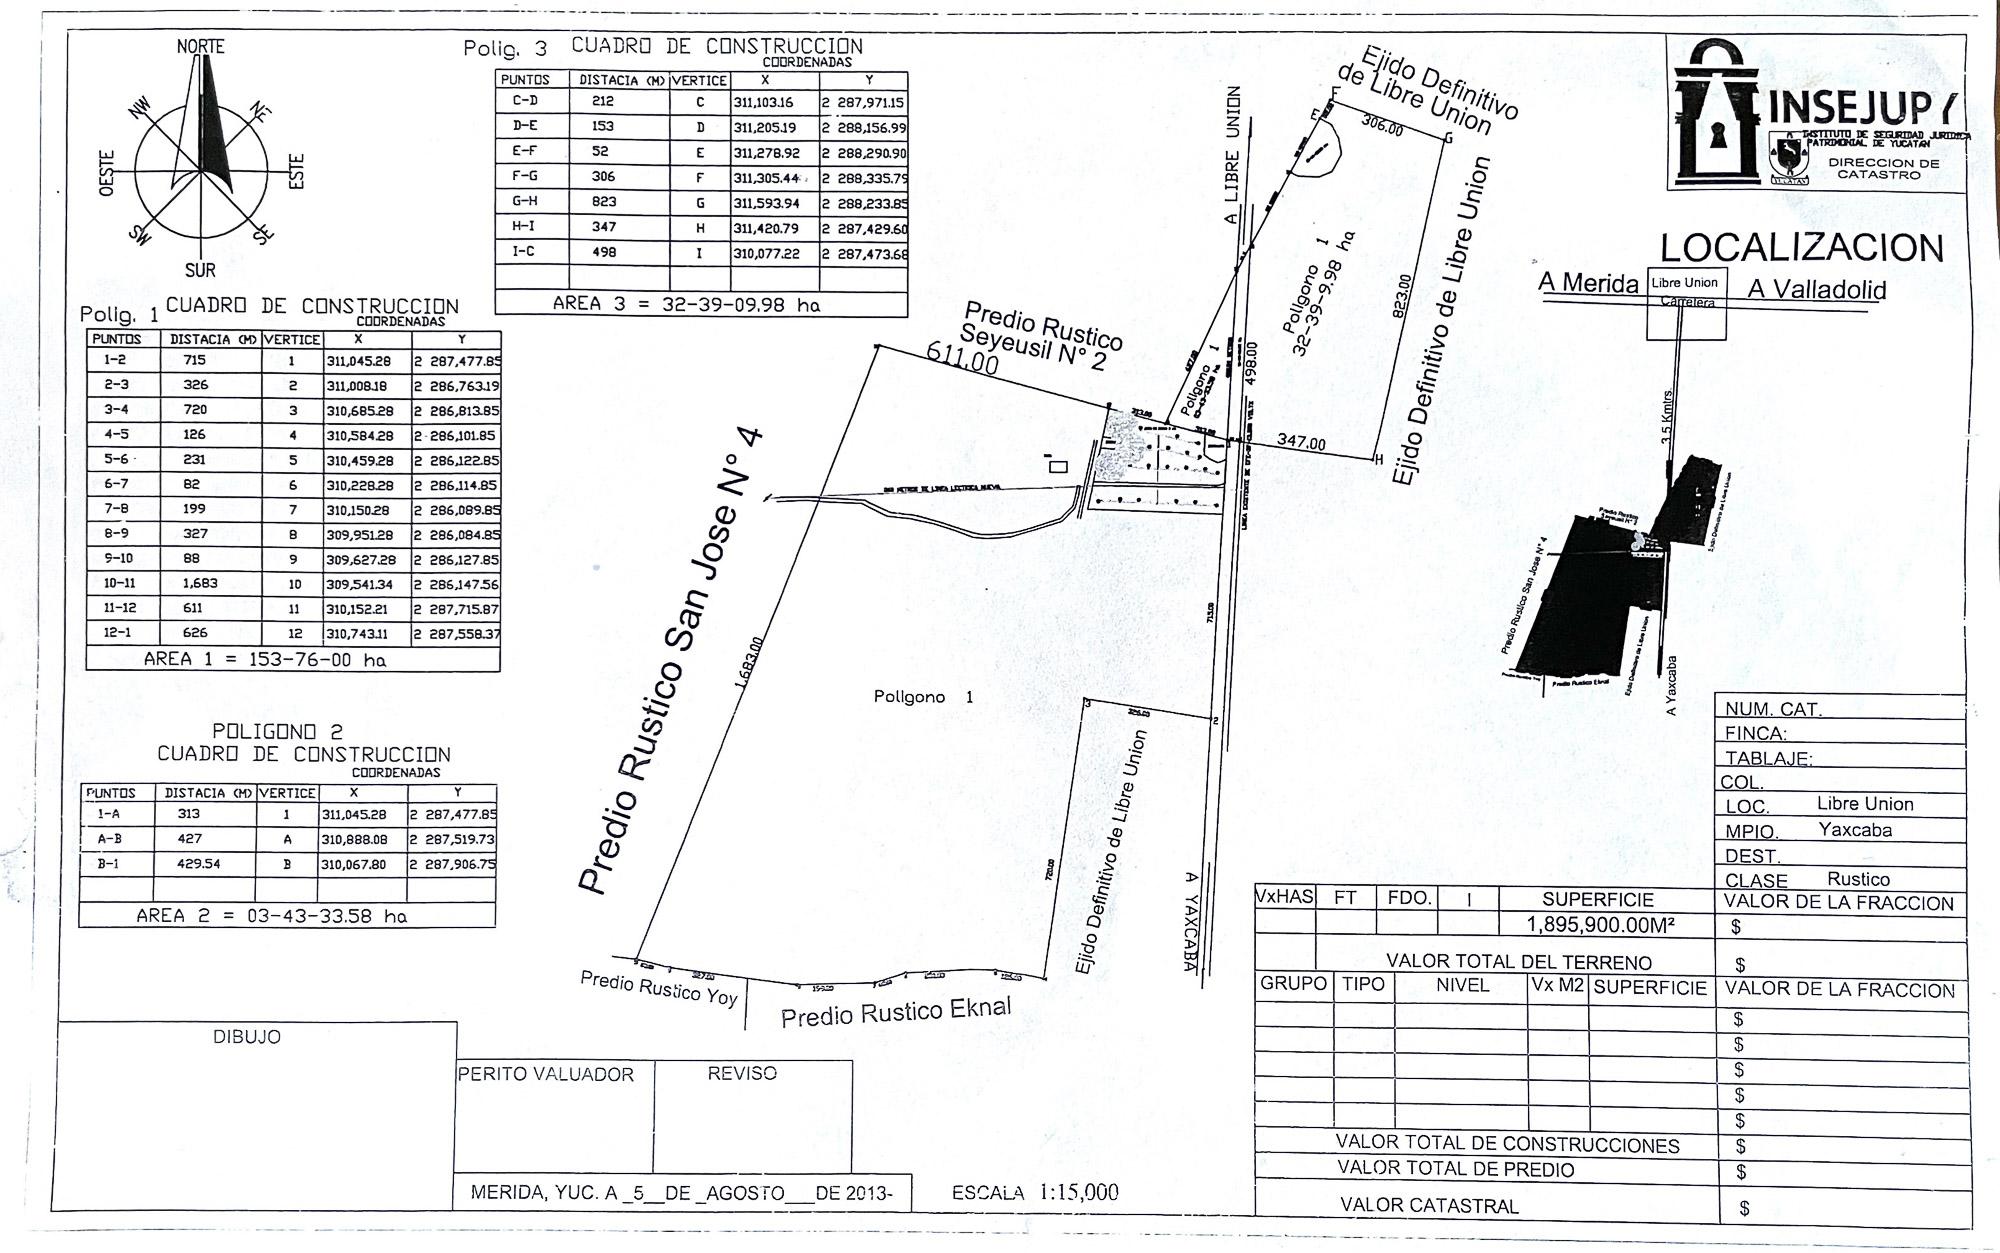 Land Registry Plan - Part I